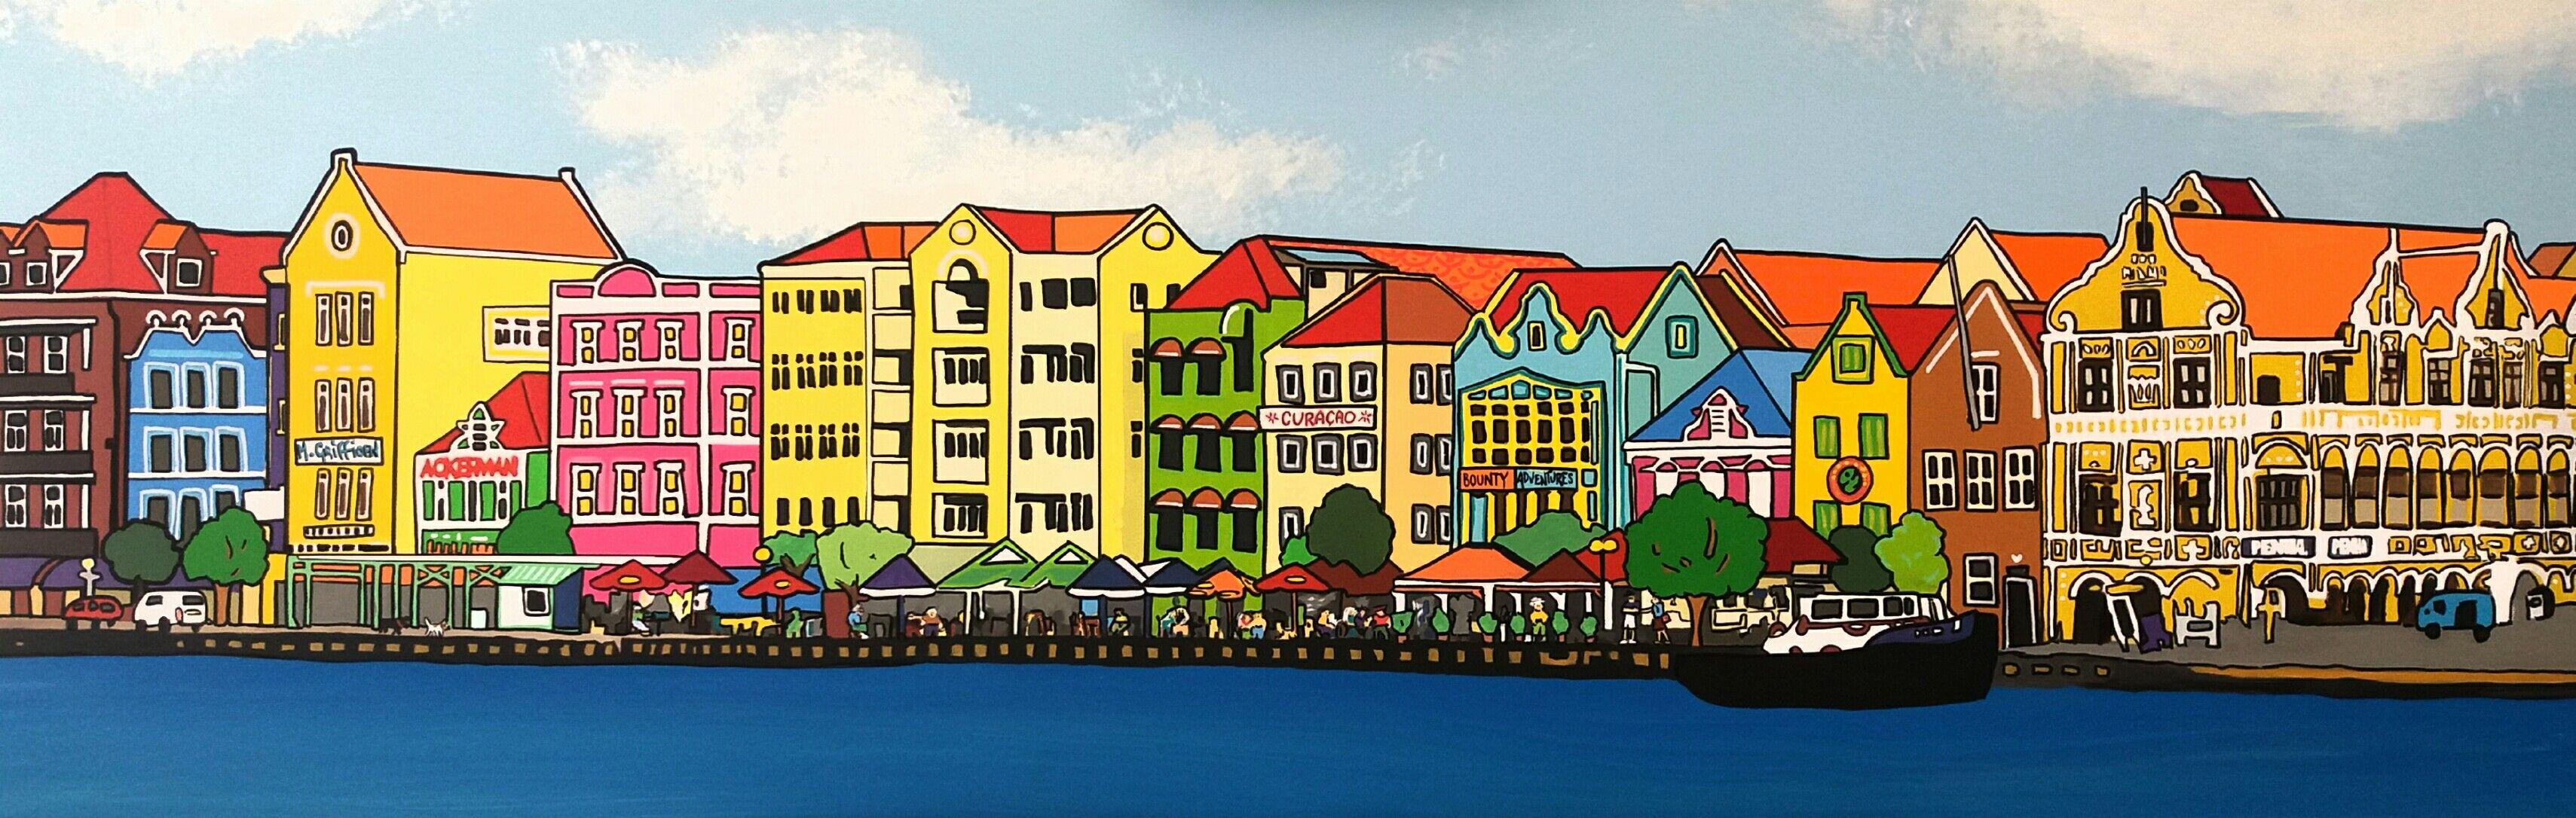 Handelskade By Mirjam Griffioen Caribbean Art Griffioenen Muur Tekening Curacao